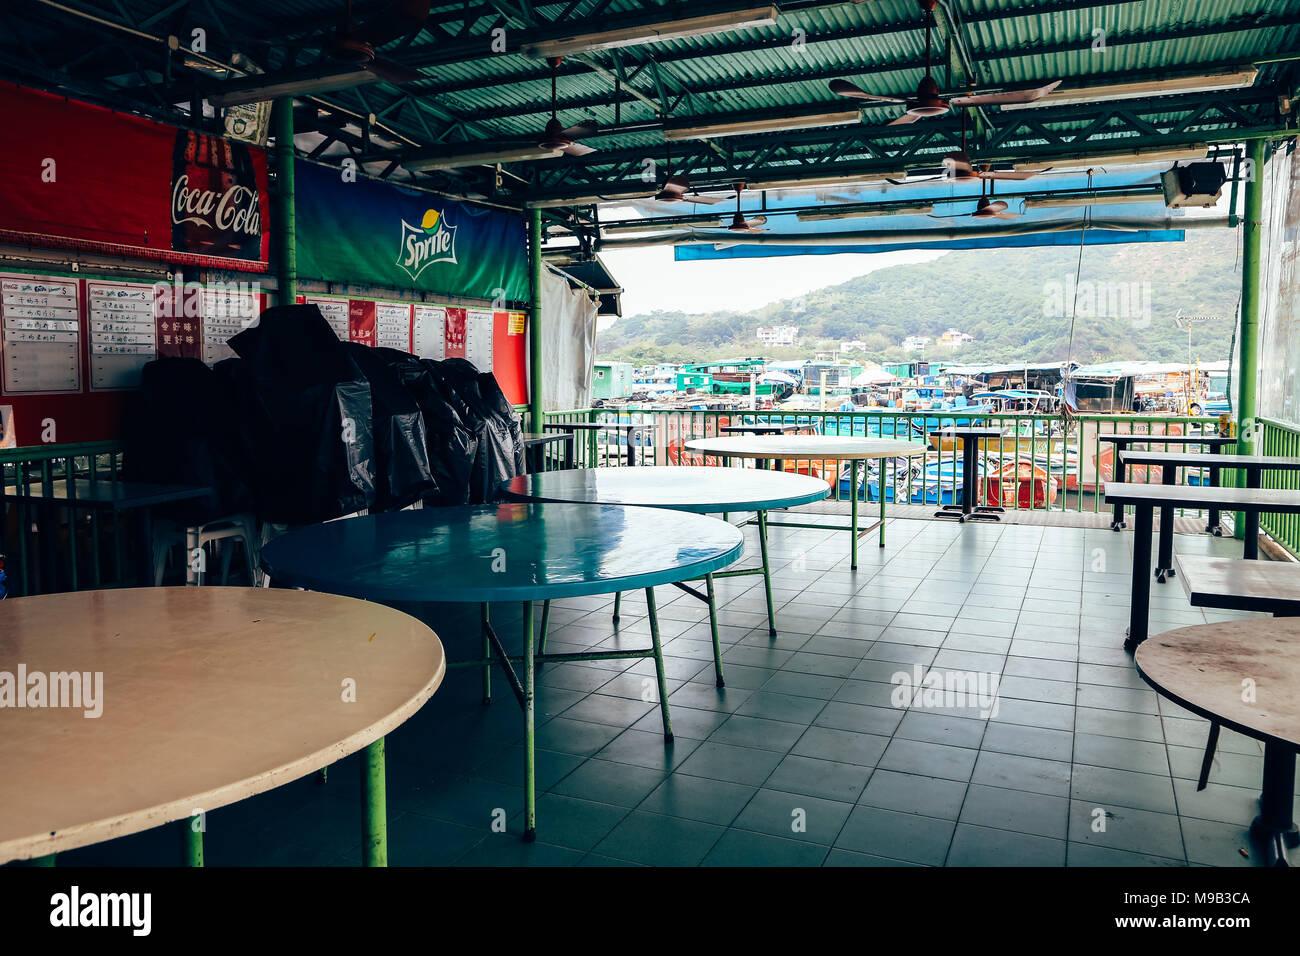 Hong Kong - March 16, 2017 : Closed restaurant in Lamma island Sok Kwu Wan Fish village - Stock Image